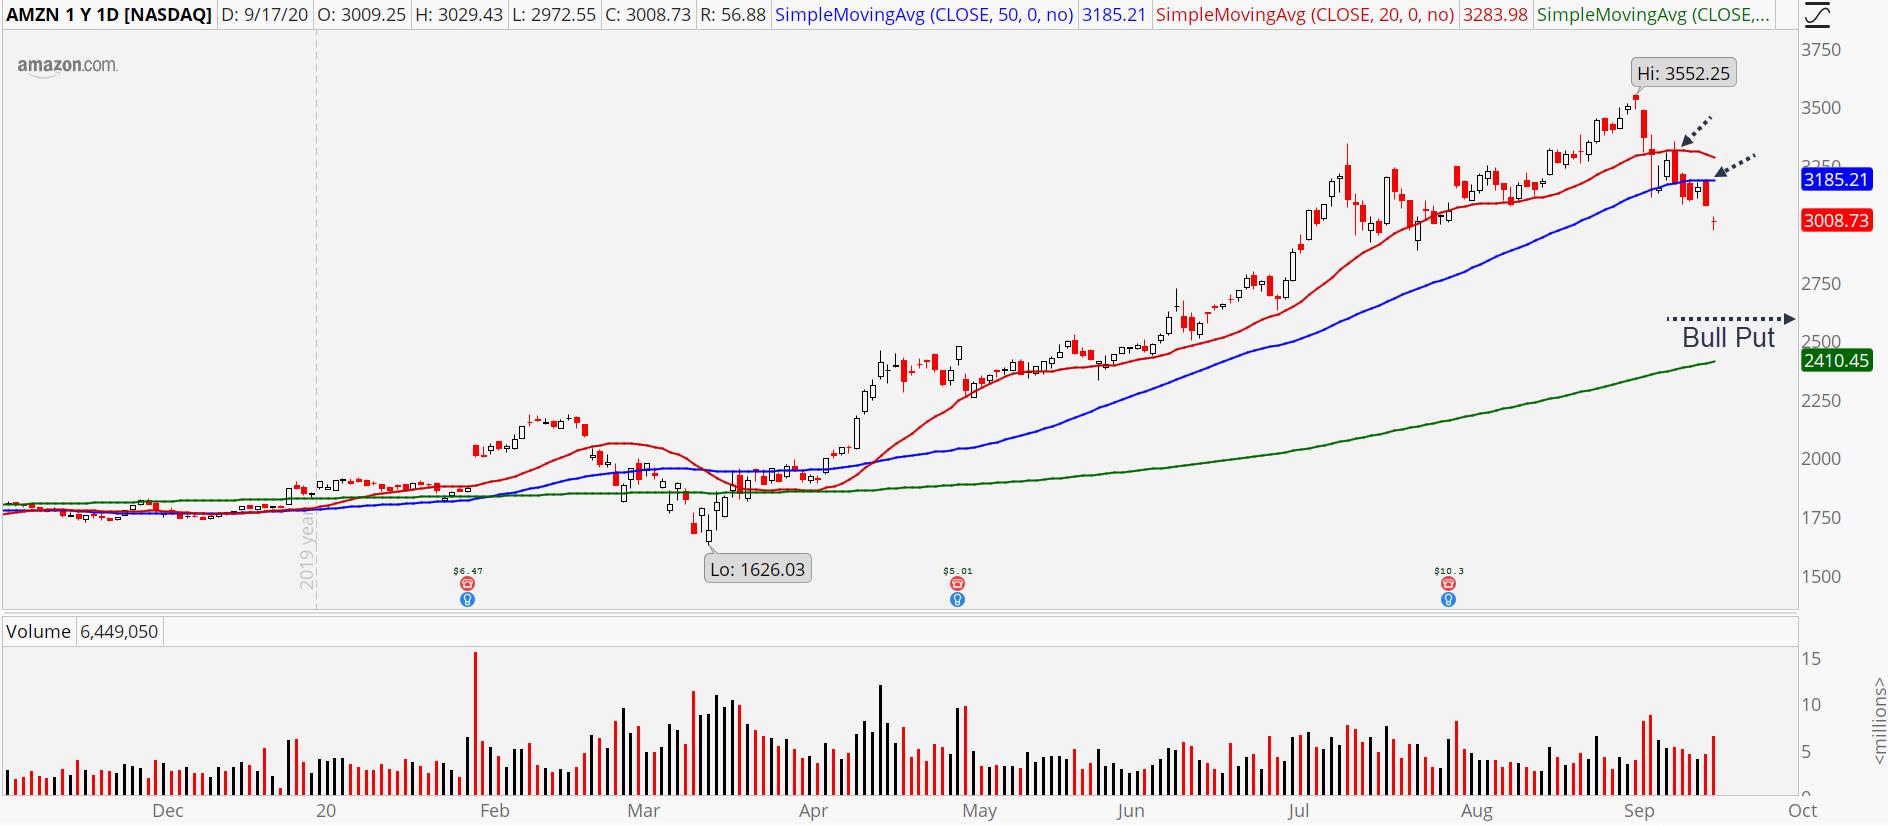 Amazon (AMZN) daily chart showing trend reversal